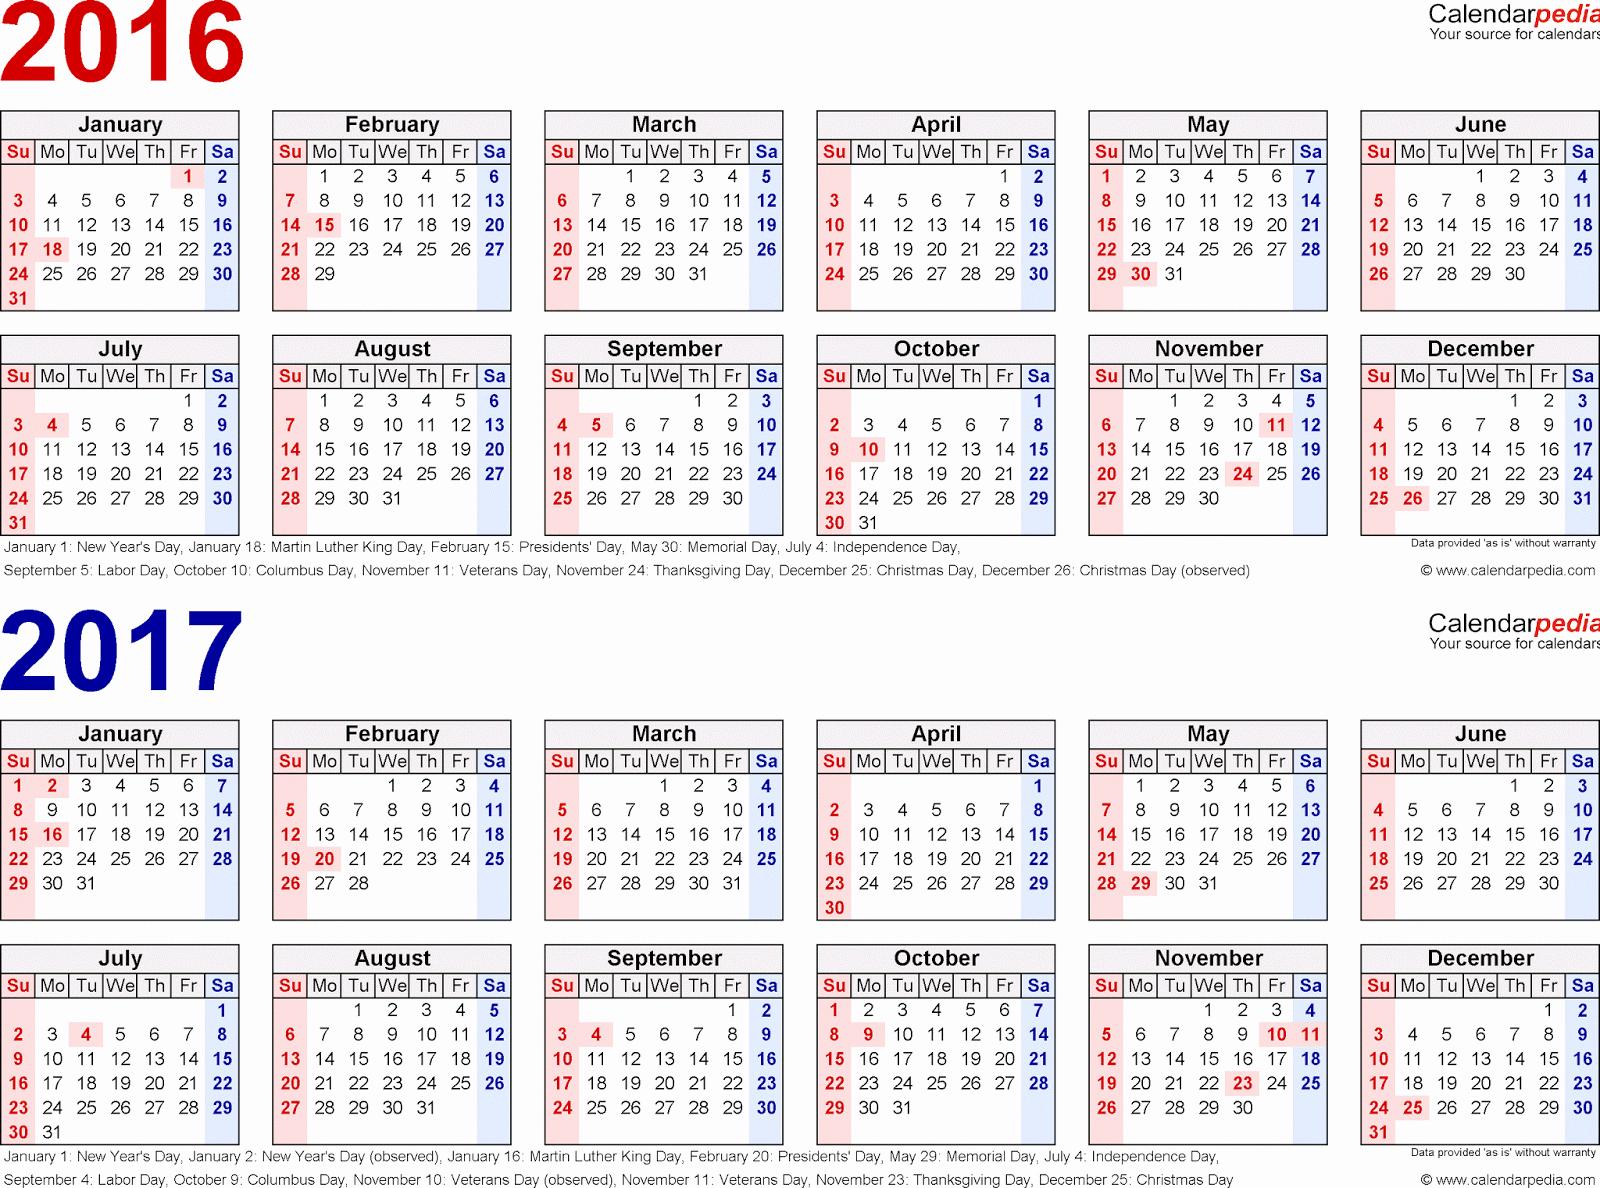 Fiscal Year Calendar 2016 Template Elegant Fiscal Year Calendar 2016 2017 Printable